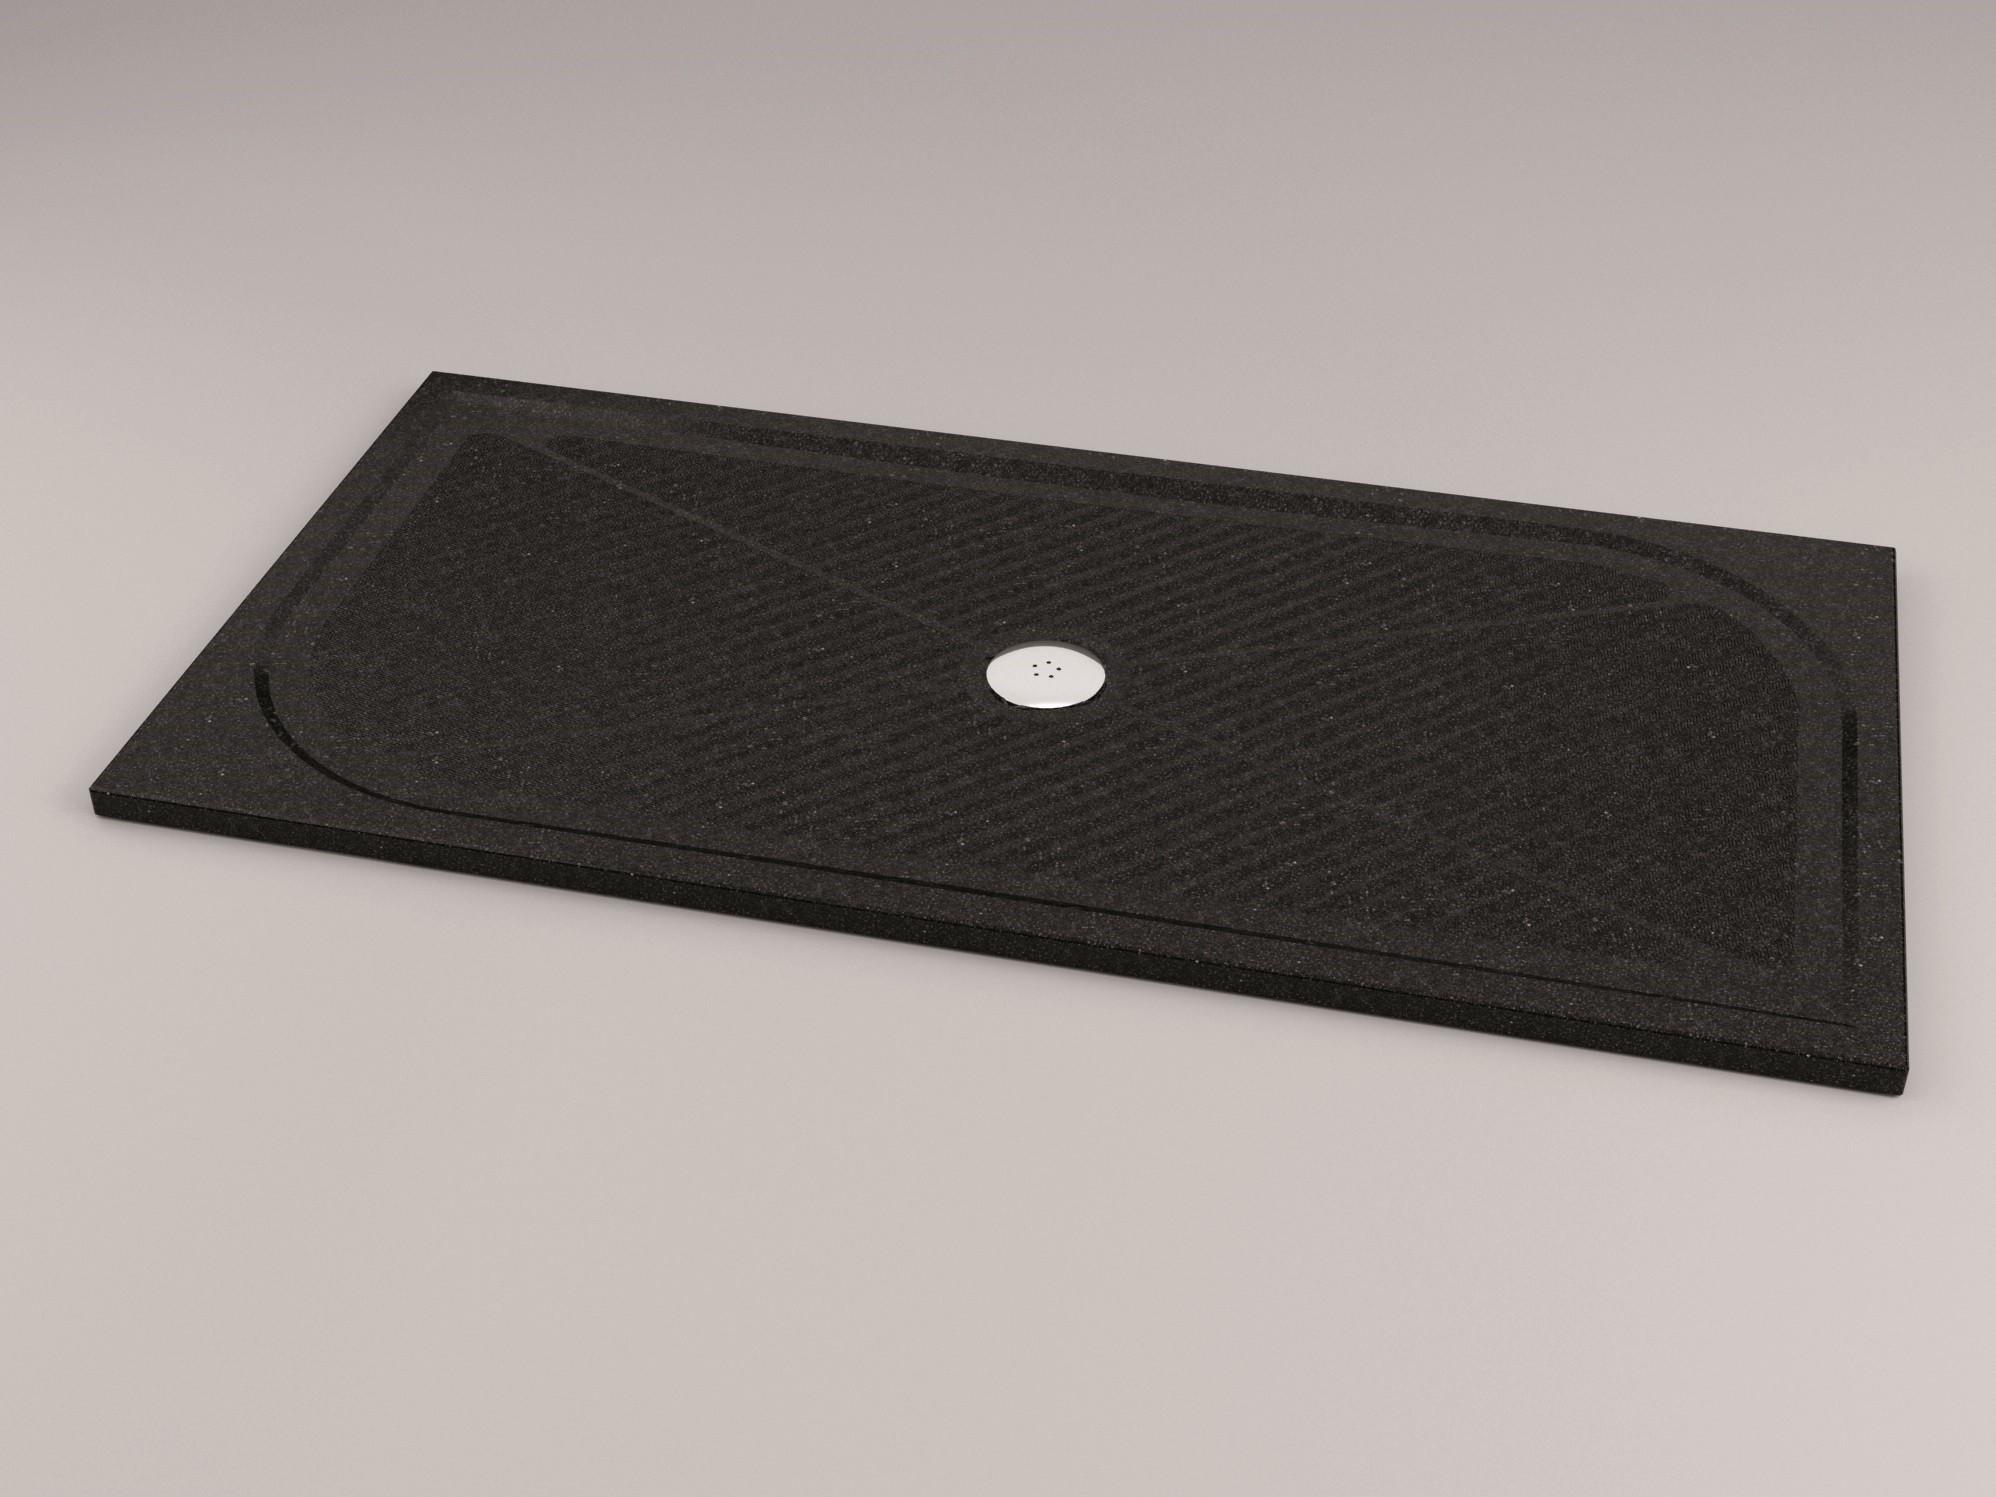 mineralguss duschwanne 120 x 90 x 1 5 cm duschwanne. Black Bedroom Furniture Sets. Home Design Ideas